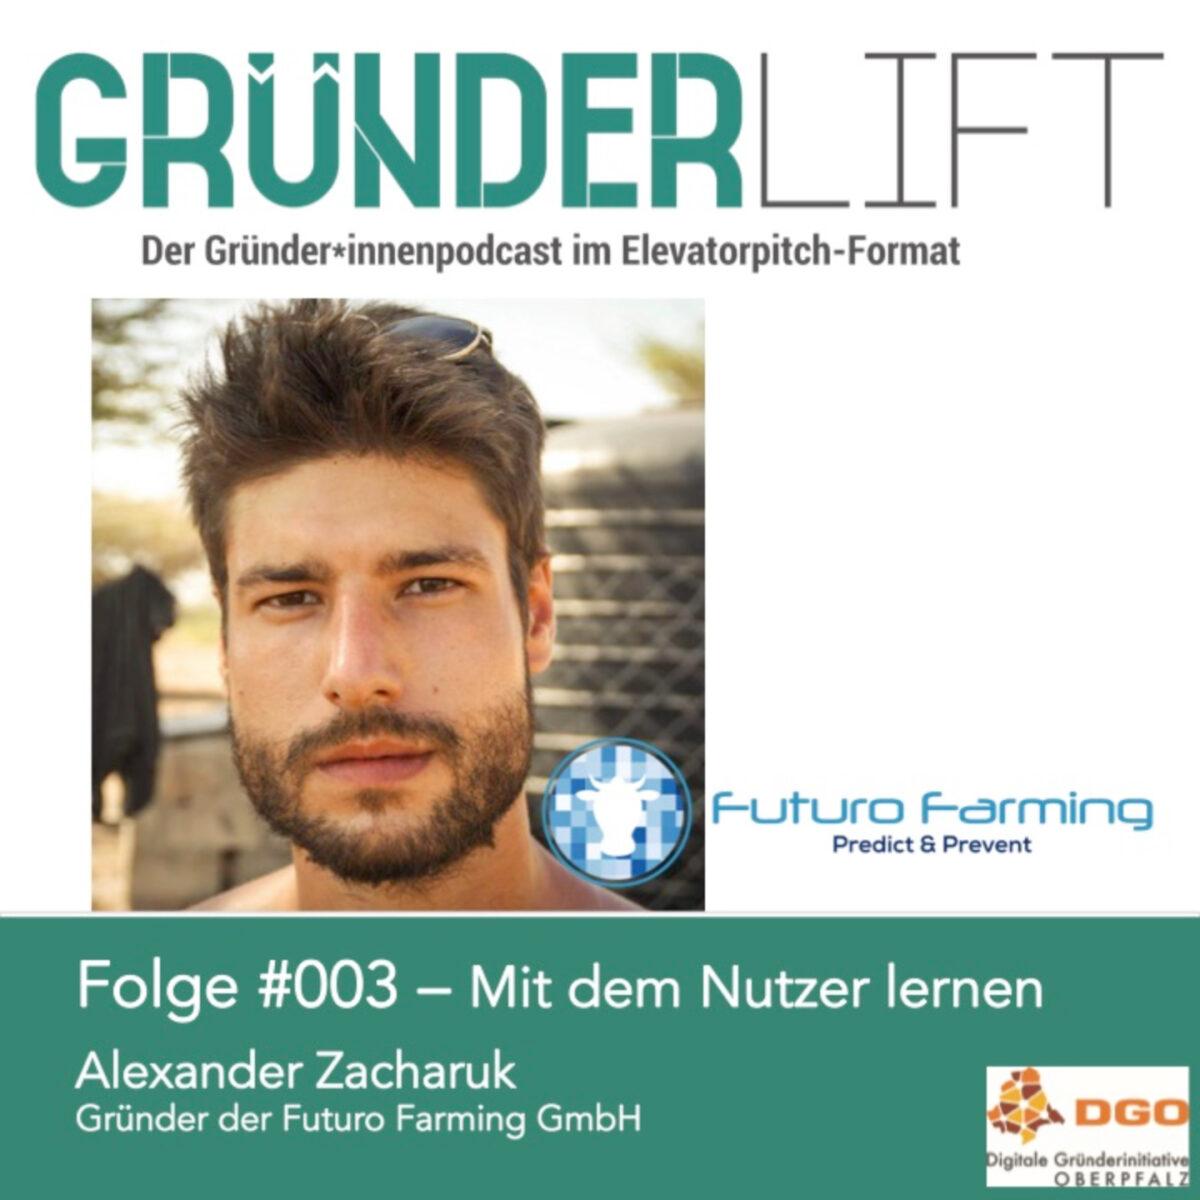 Gründerlift_#003_Alexander Zacharuk_FuturoFarming